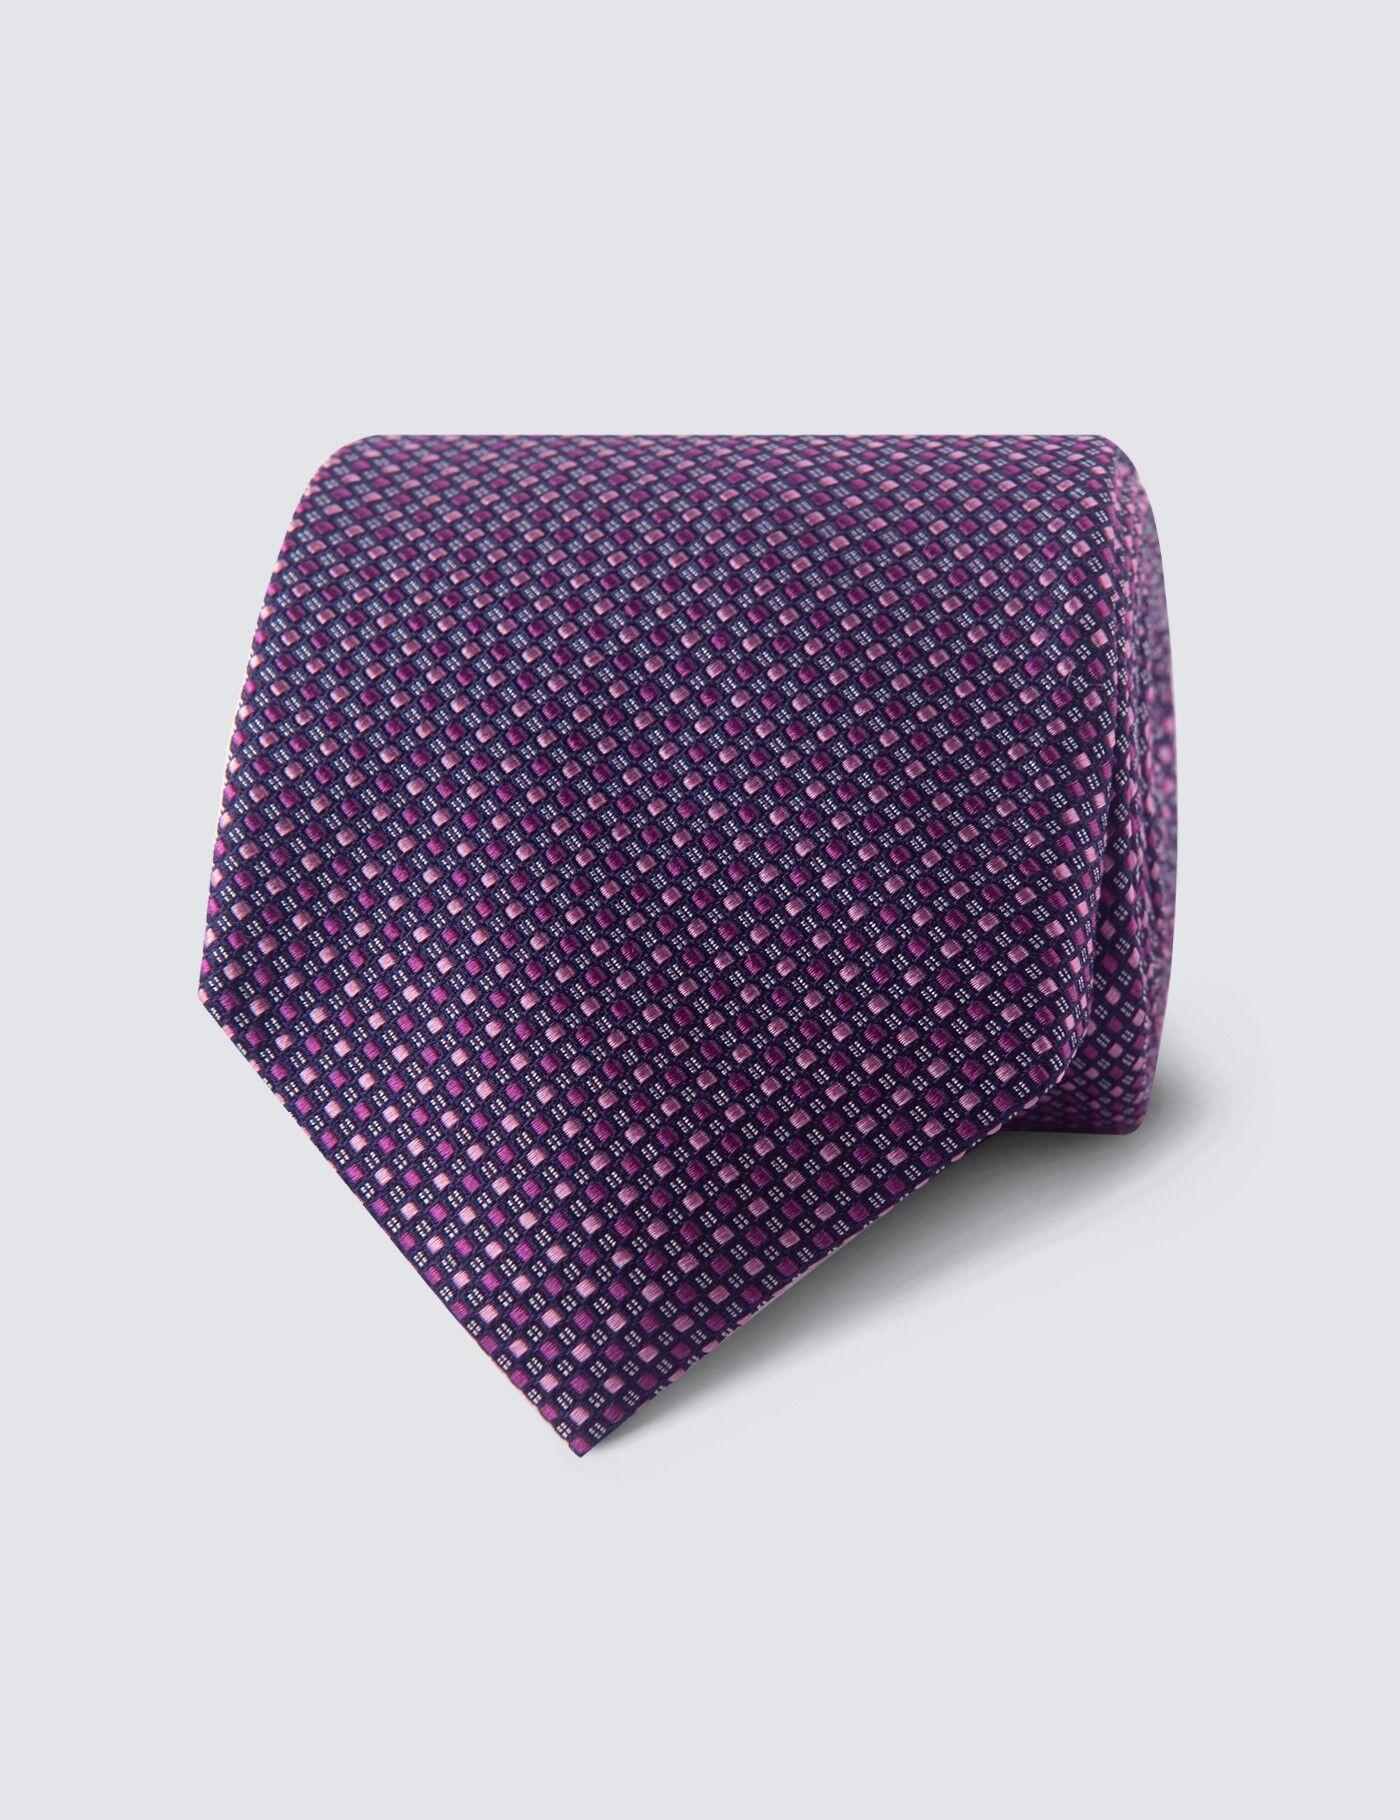 Hawes & Curtis Men's 2 Tone Squares Tie in Pink 100% Silk Hawes & Curtis